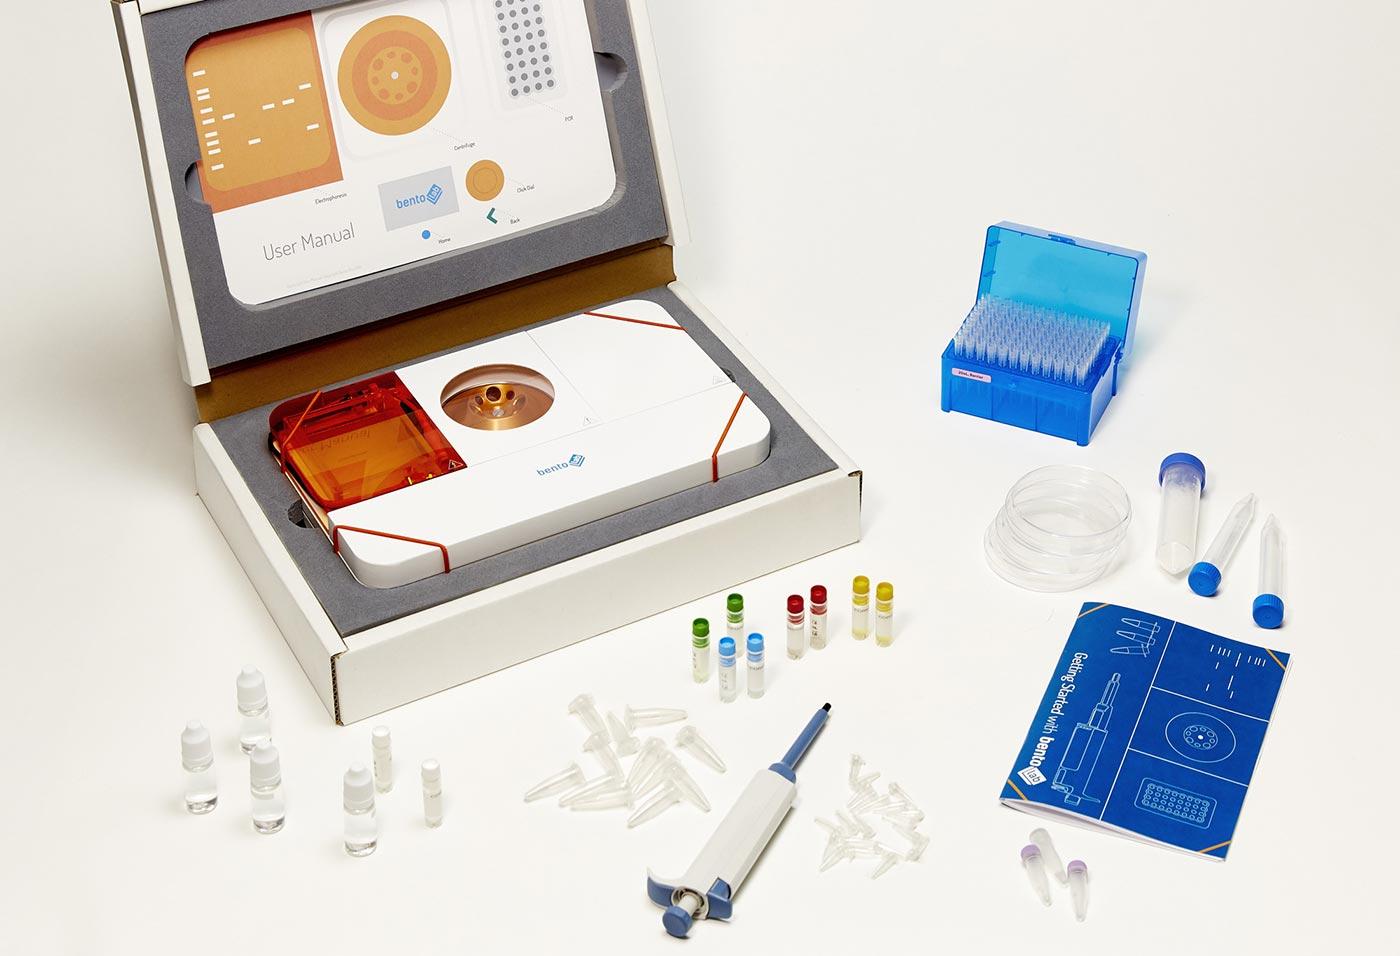 Bento Lab. Press image used with permission.